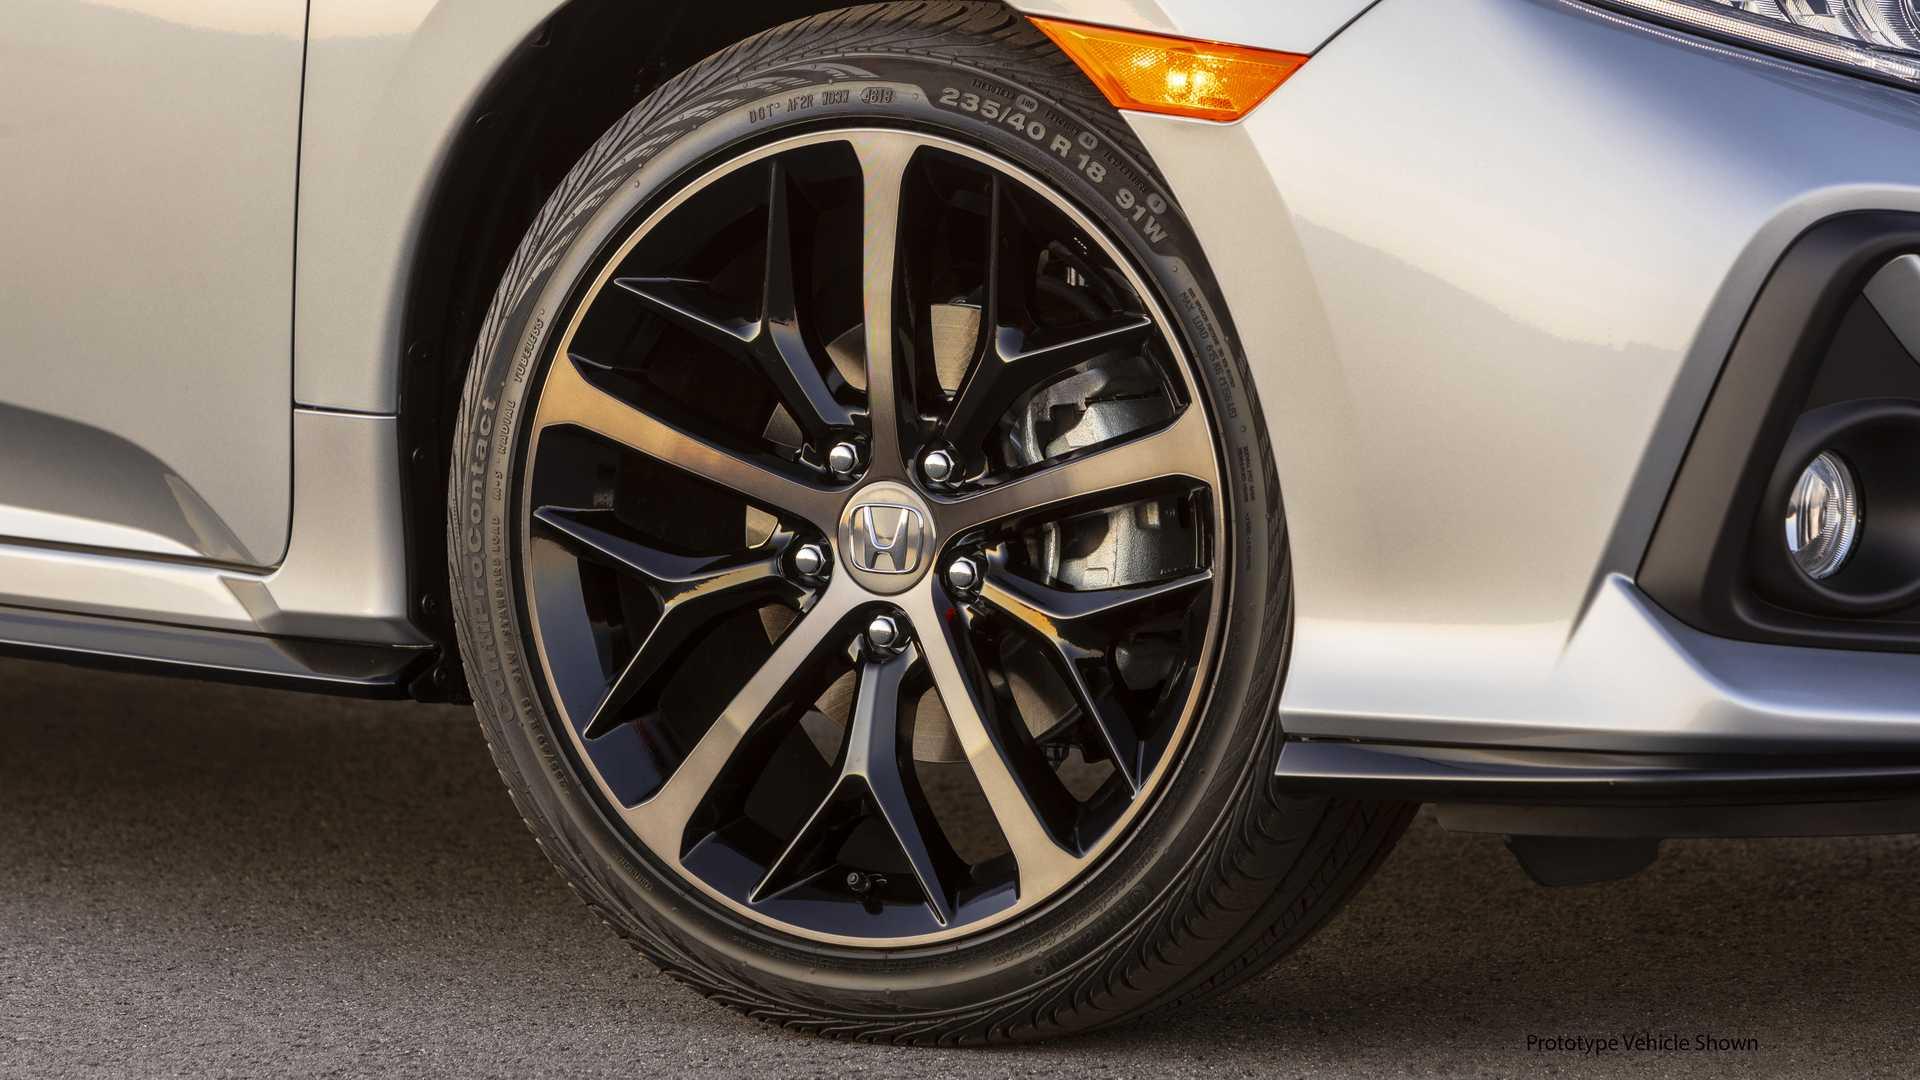 2020 Honda Civic Hatchback Wheel Wallpapers (5)